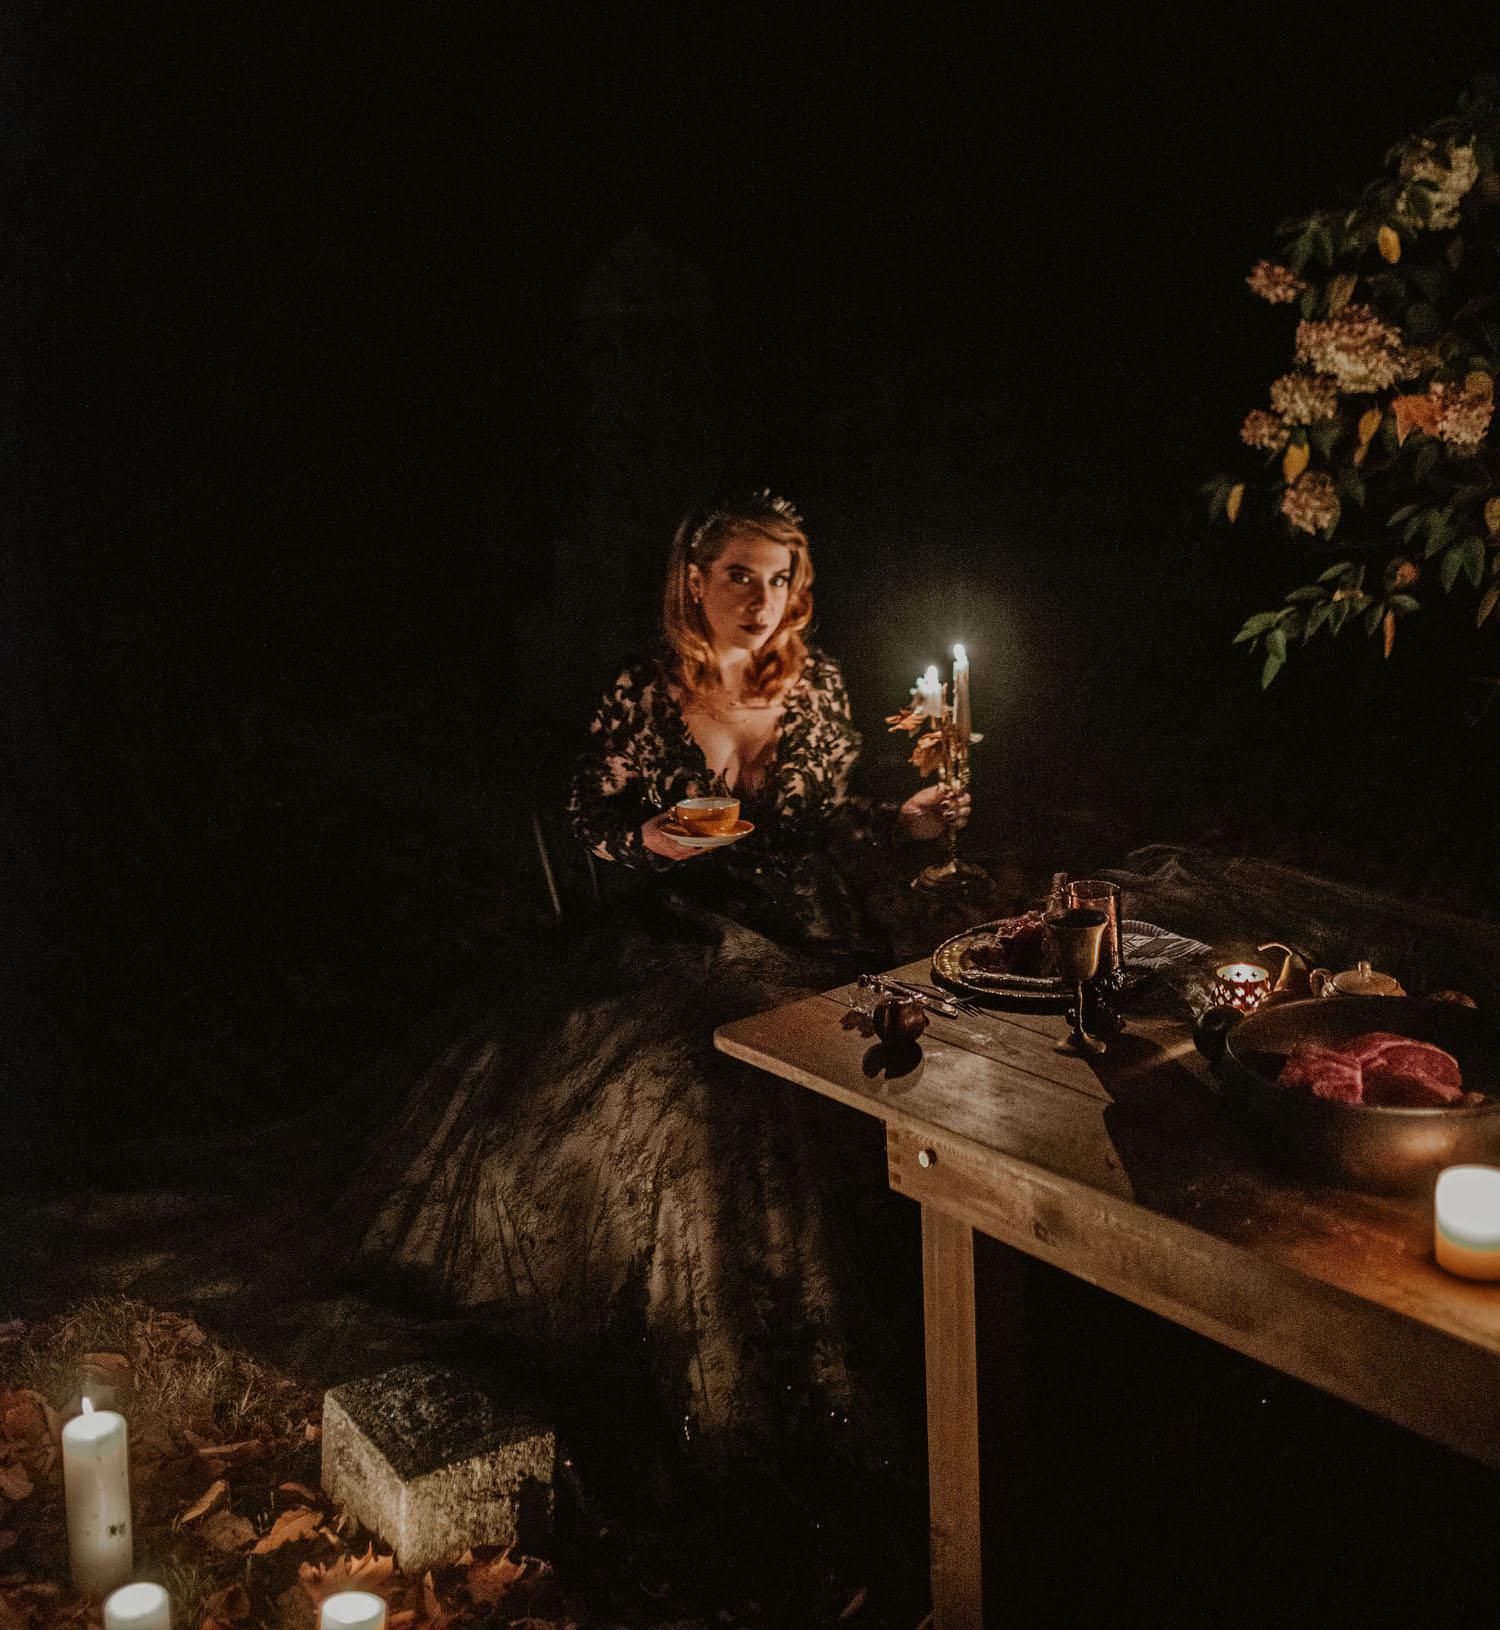 Friedhof Halloween Hochzeit Inspiration